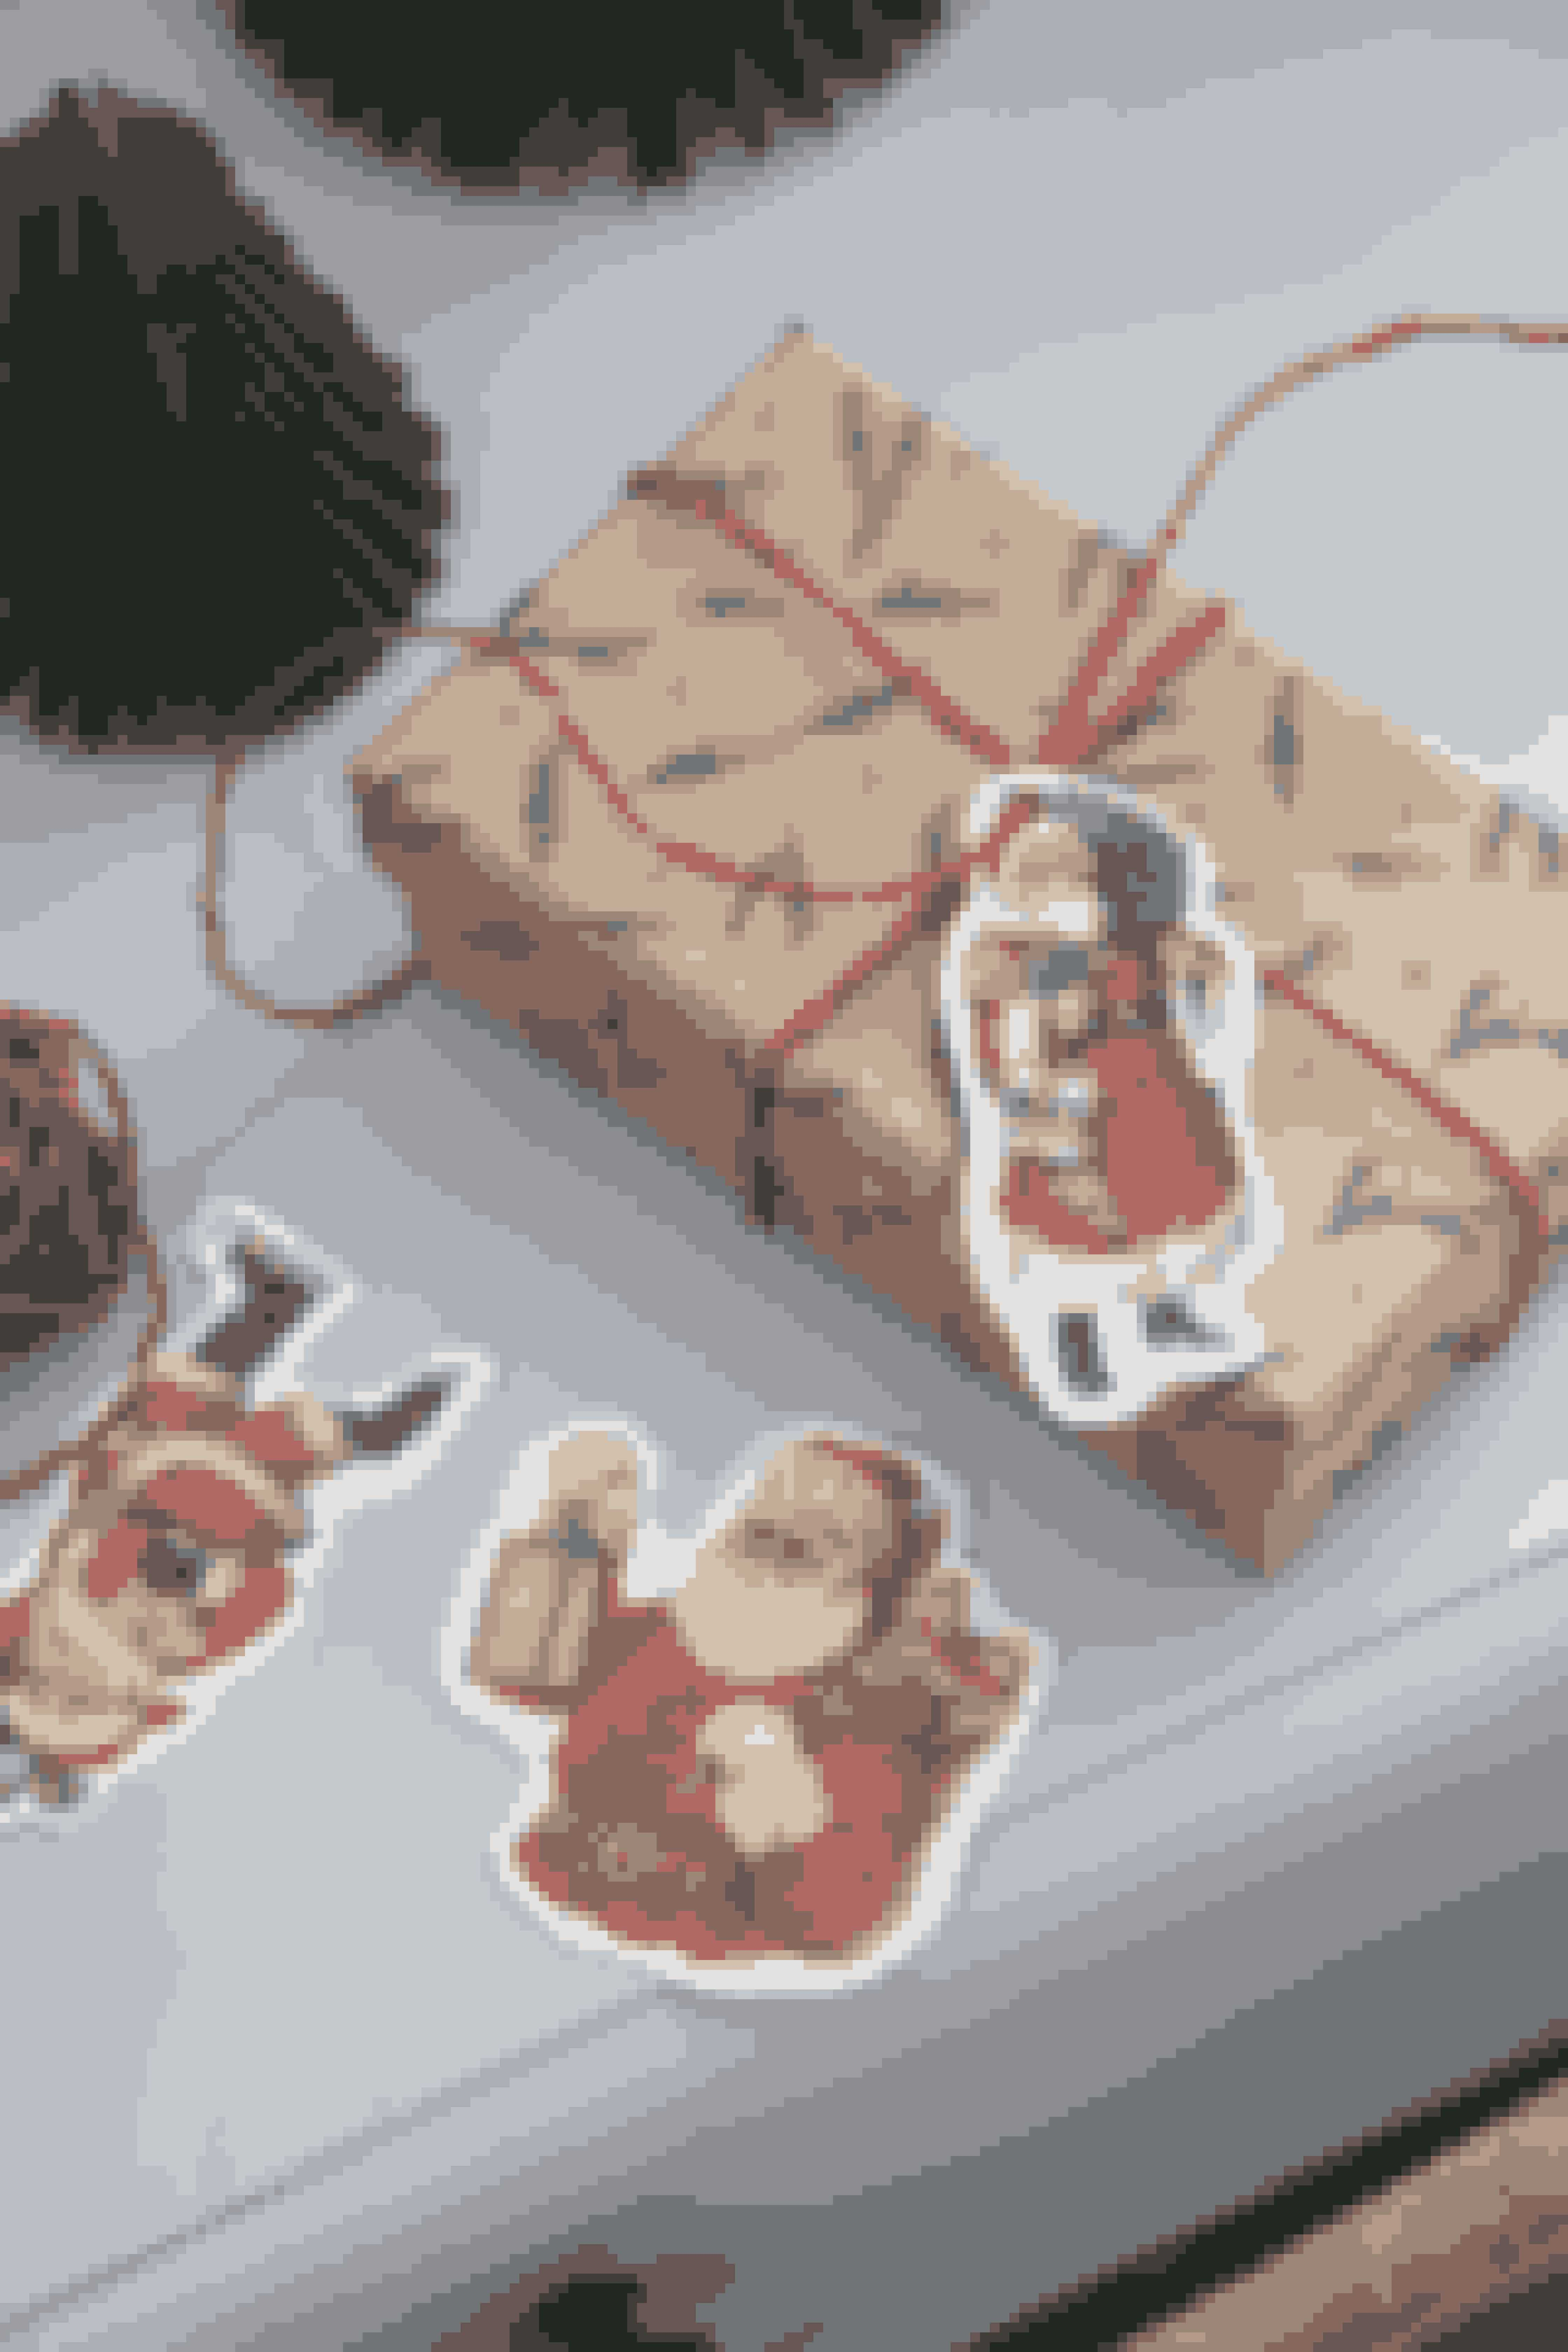 Pynt årets julegaver med de fineste til- og frakort i gammelt design. Perfekt til at fremme julestemingen.Mærkater,fås i 8-pak. Pris: 5,48 kr. Gavepapir, fås i flere varianter. Pris: 10,88 kr.